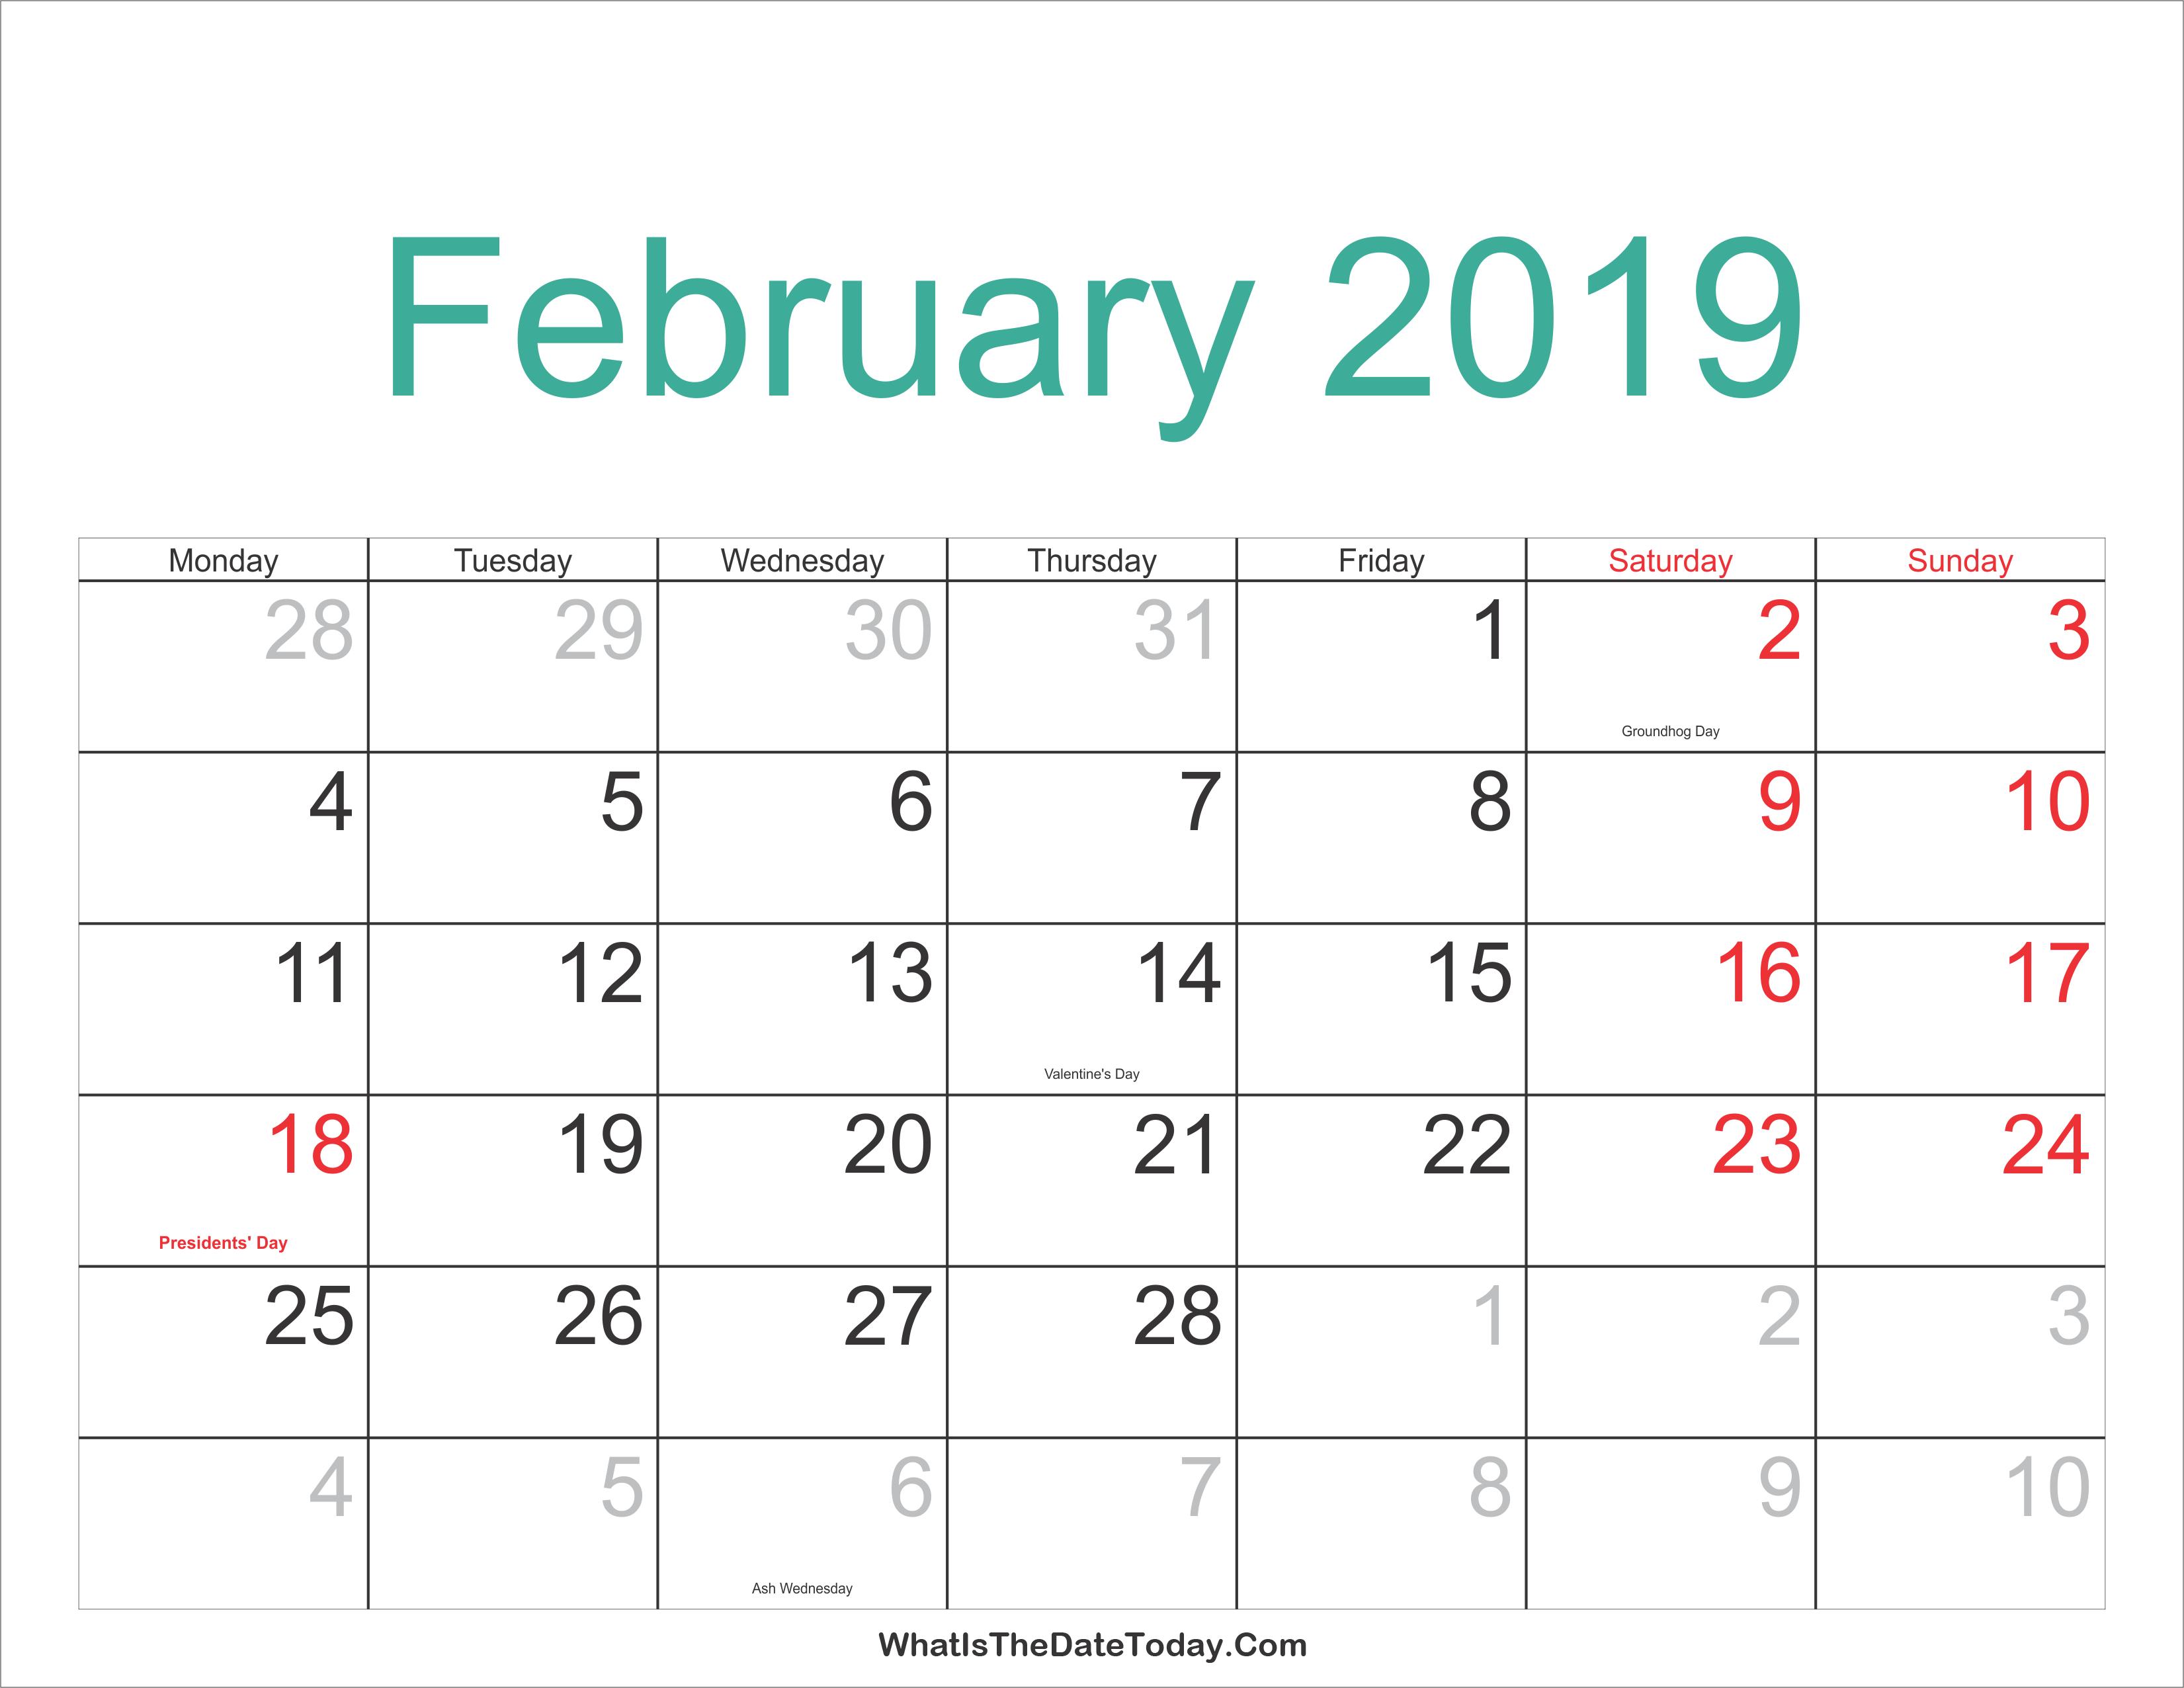 Feb 2019 Calendar Holidays – Free Printable Calendar Templates Blank Feb 7 2019 Calendar